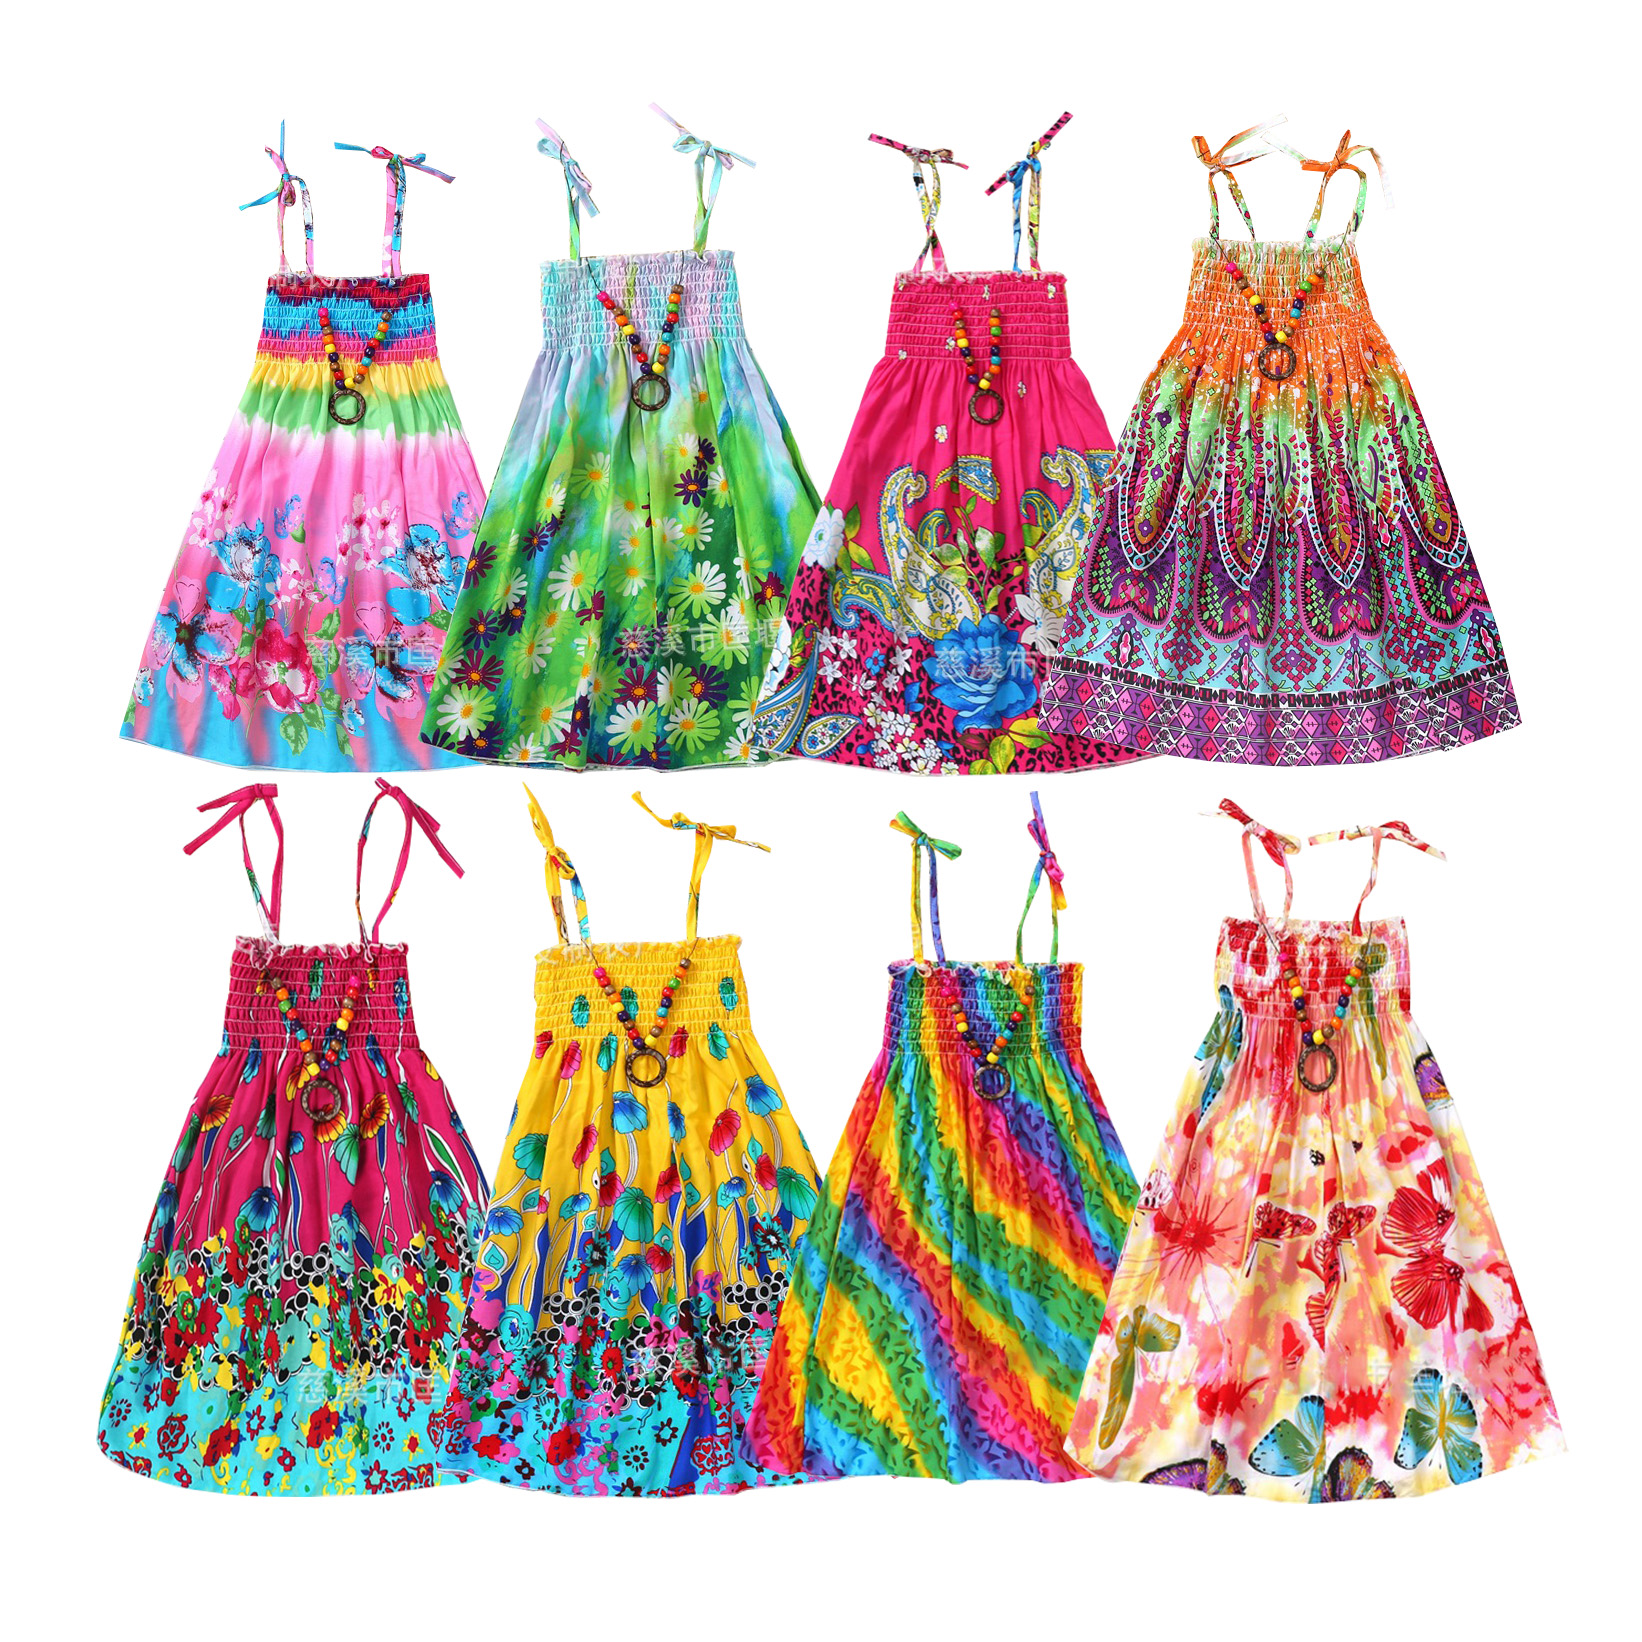 HTDBKDBK Women Simulation Silk Ladies Pajamas Lingerie Robe Bathrobe Bride Dressing Gown